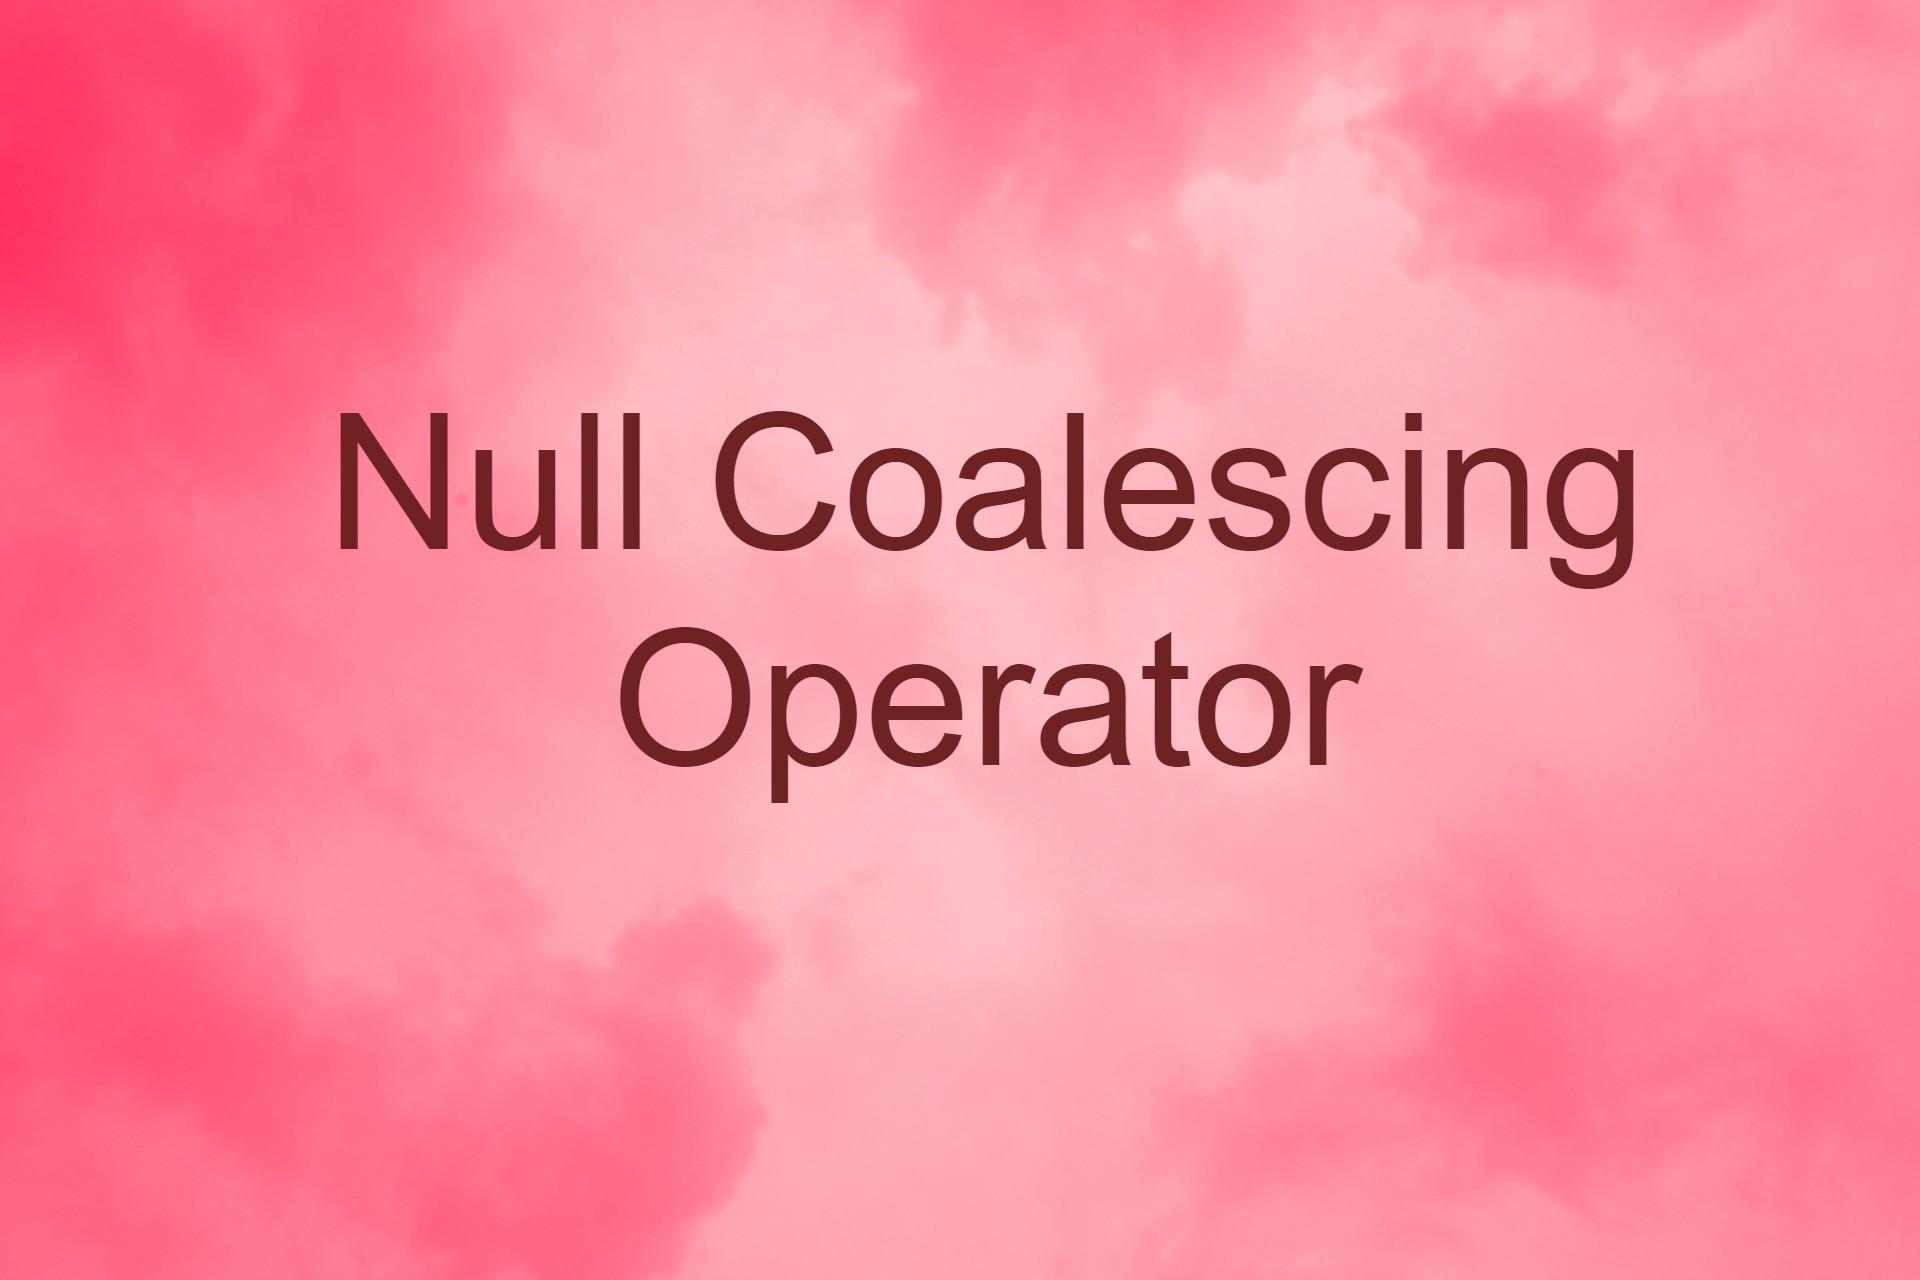 Null Coalescing Operator